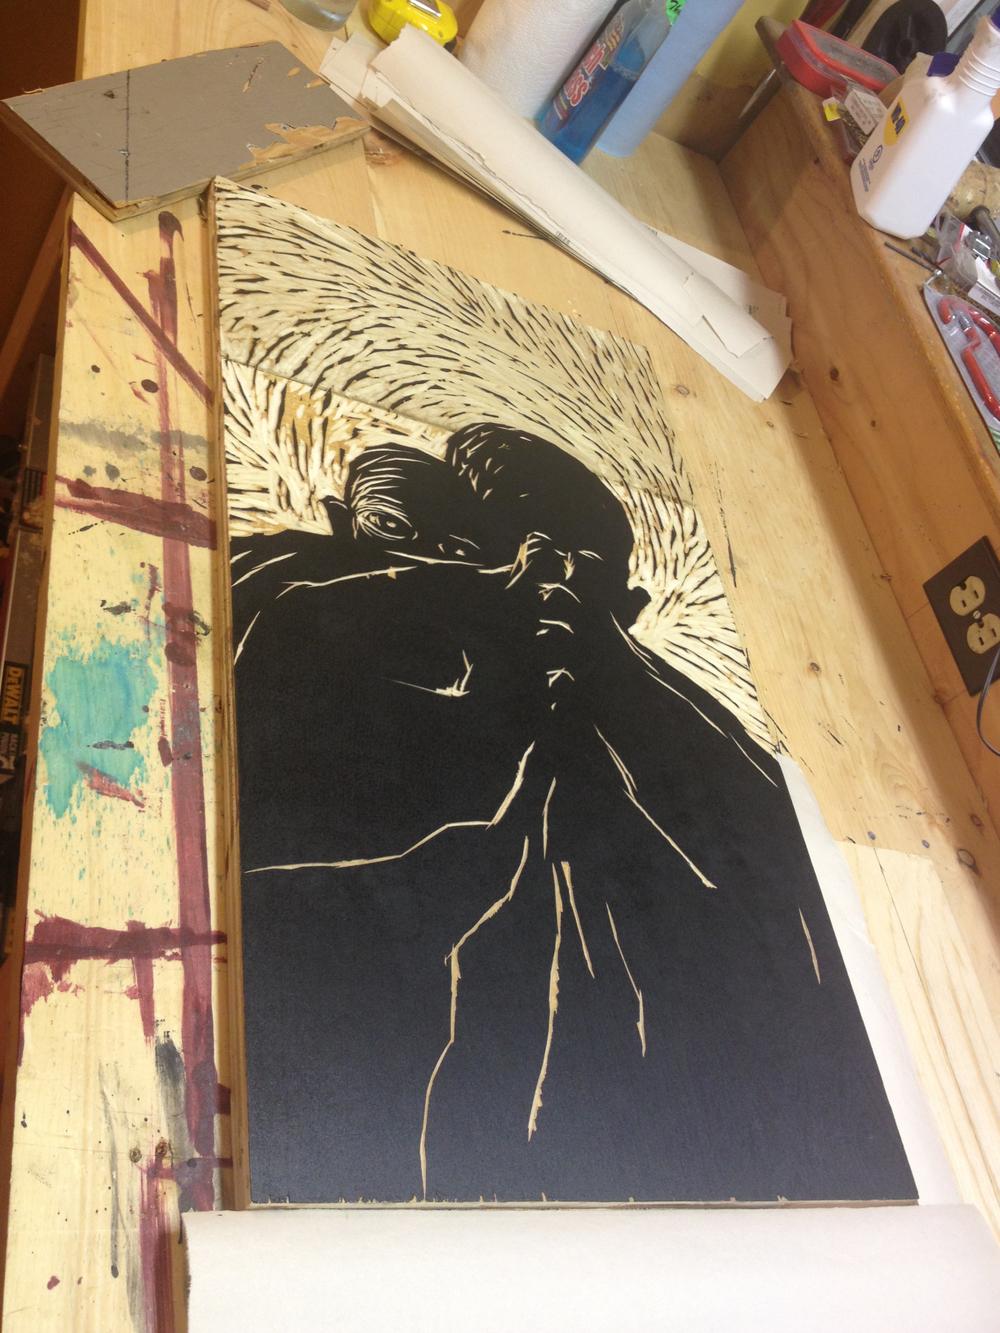 Inked block